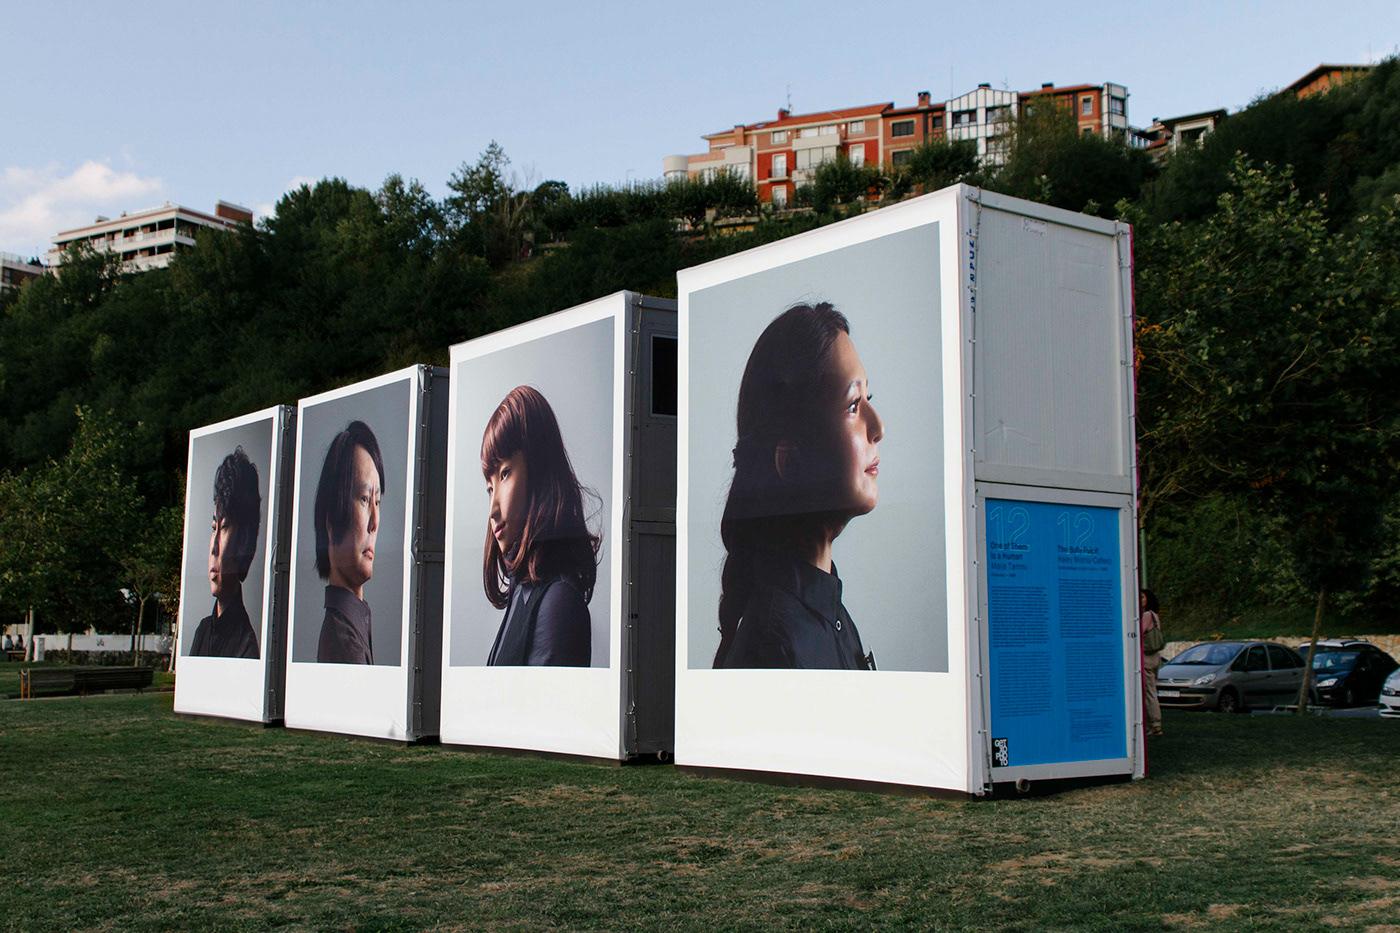 branding  Exhibition  exhibitiondesign festival festivalgraphics generative generativedesign motion visualidentity Getxophoto